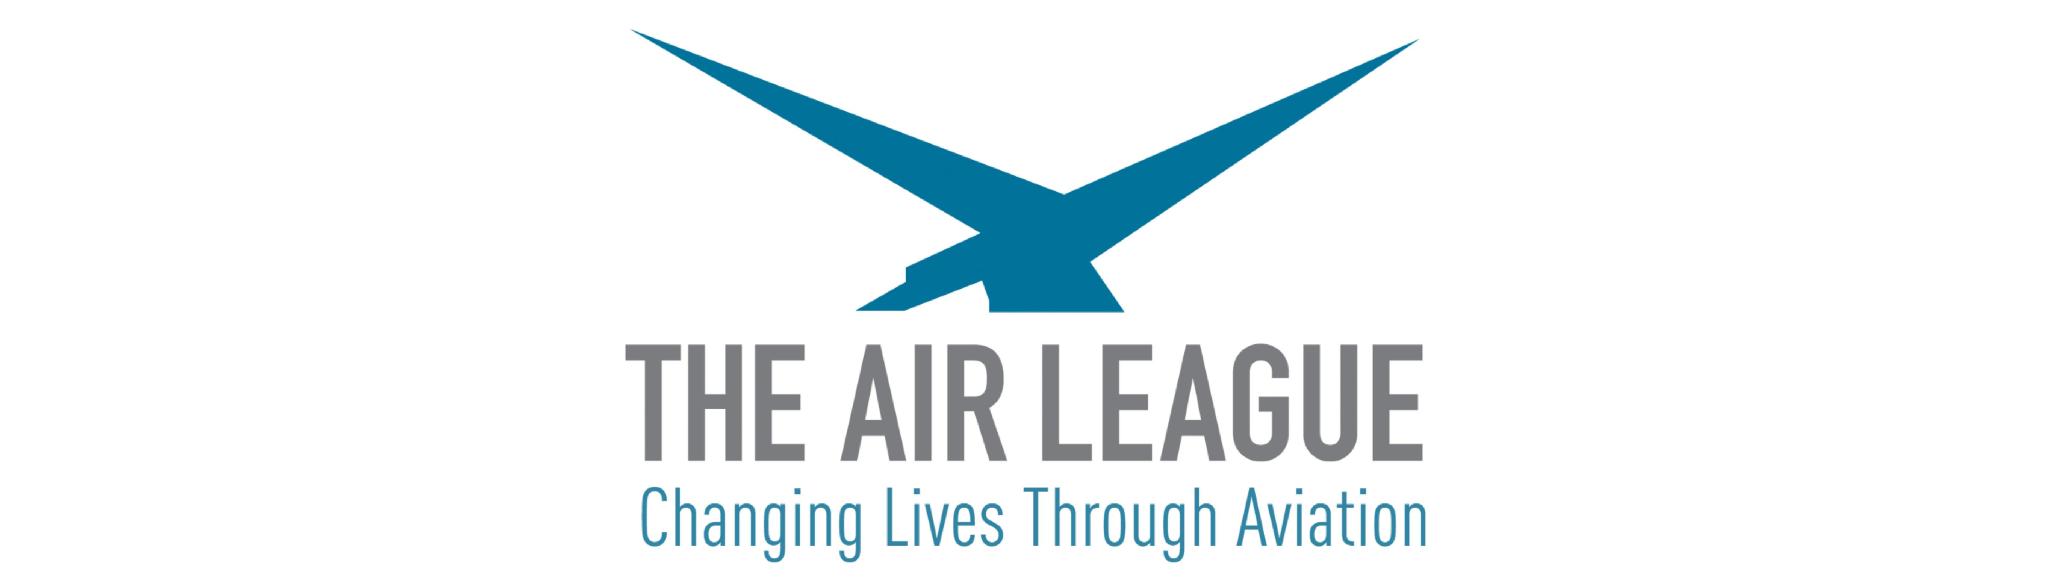 Air League logo 2019 PDF page 001